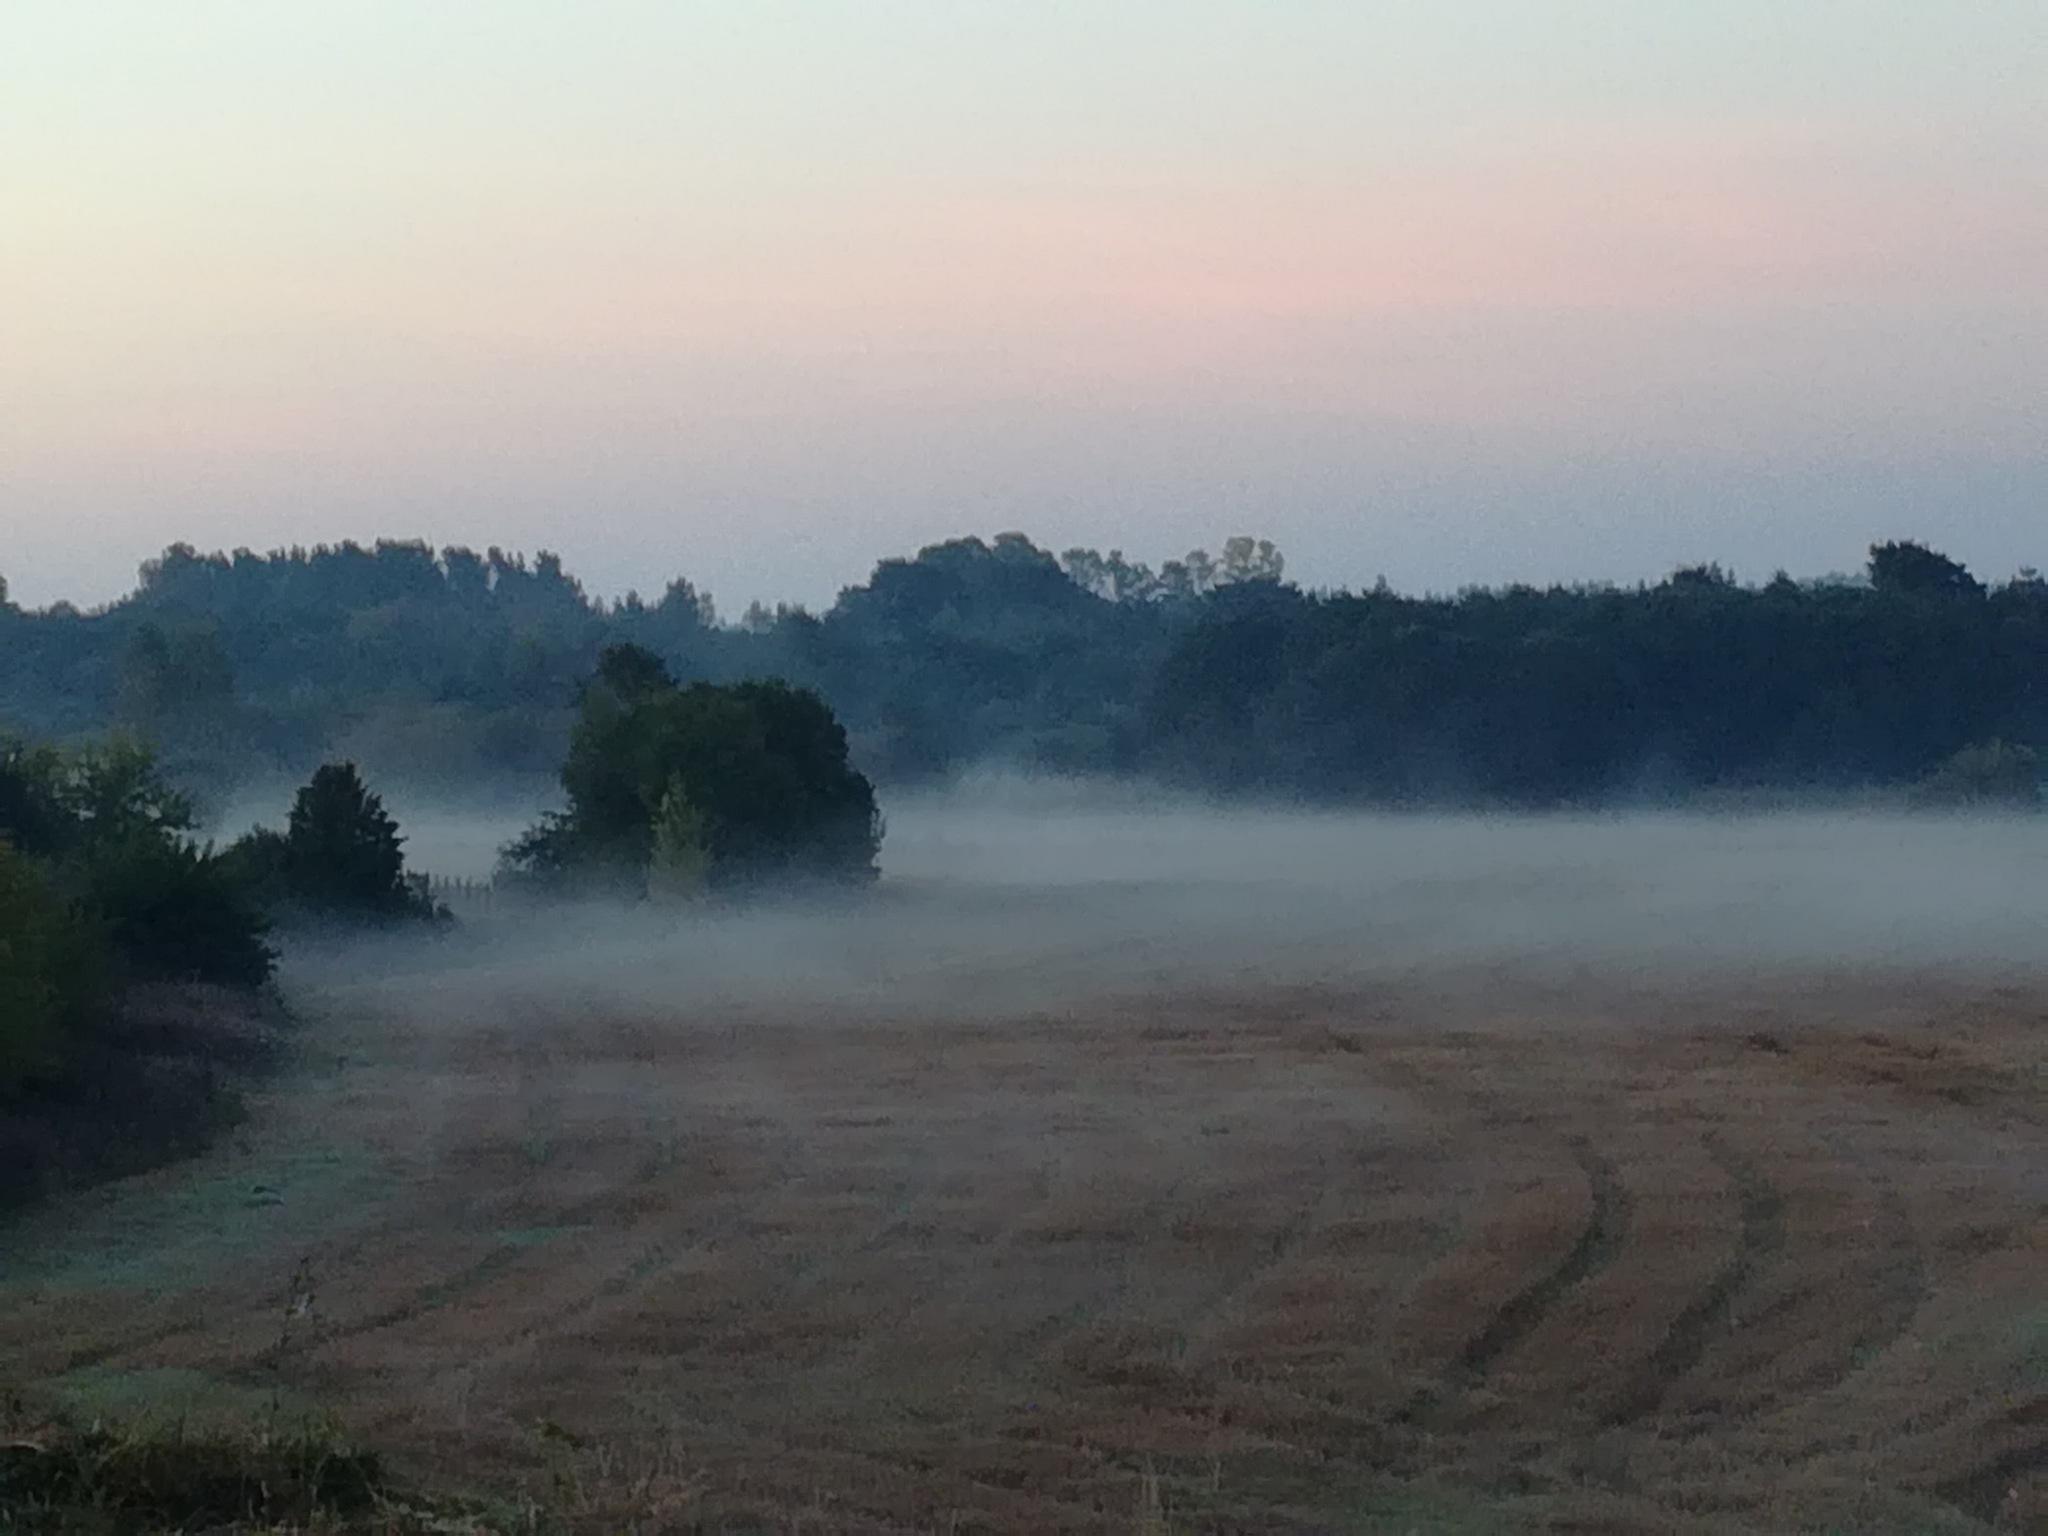 Landscape in the autumn by uzkuraitiene62